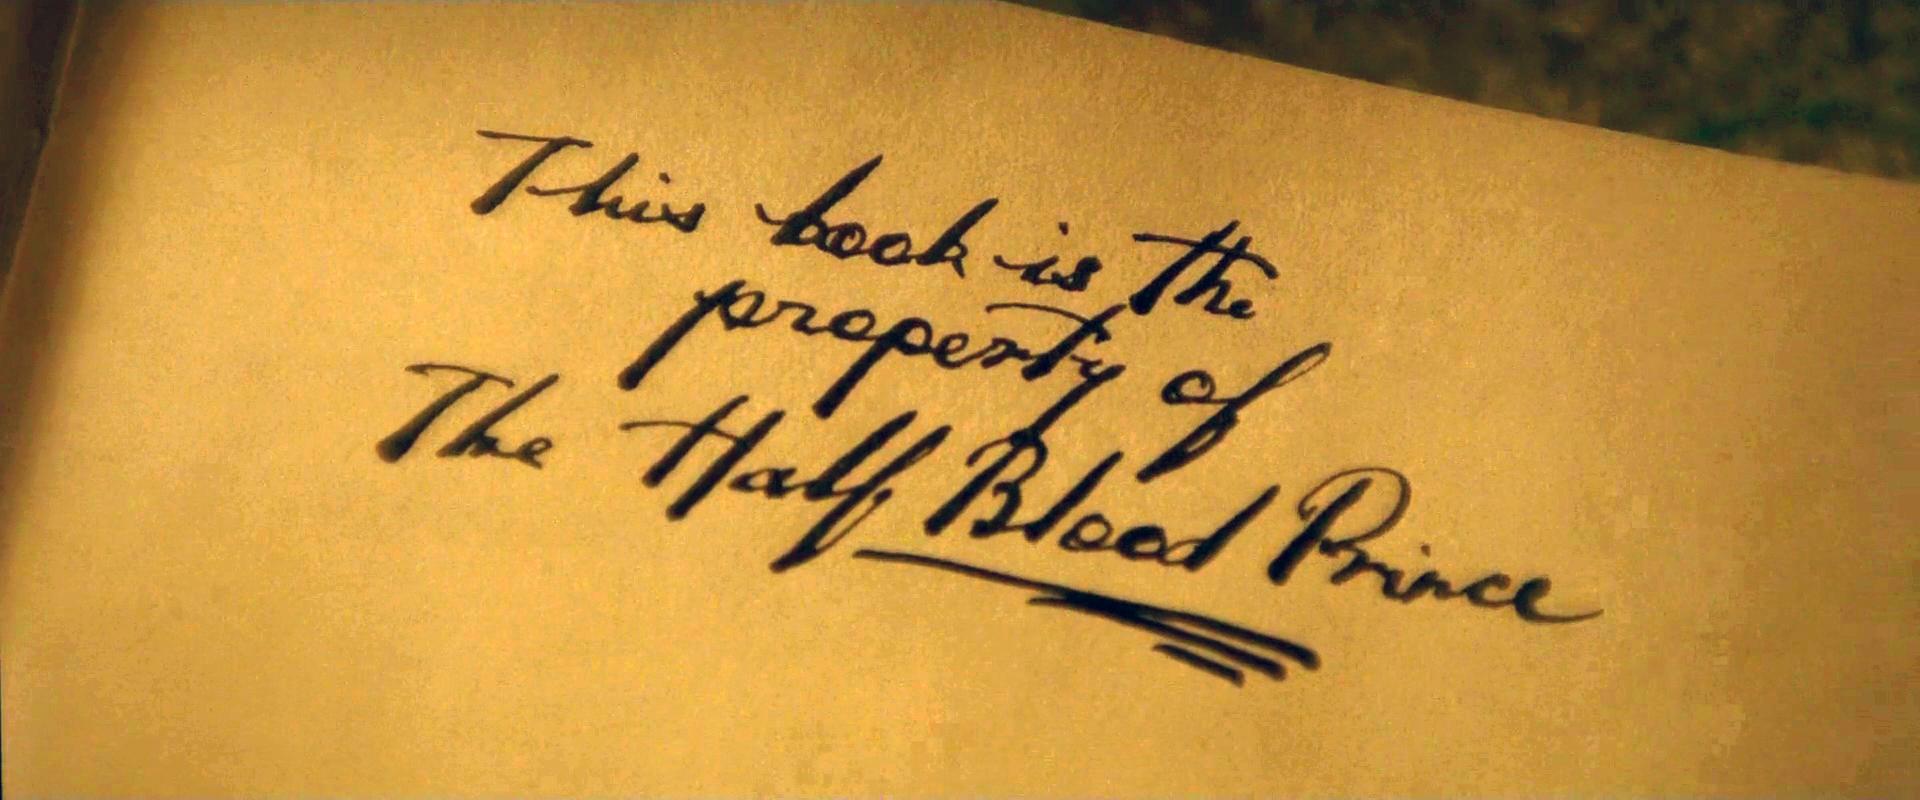 Image - Property of the Half-Blood Prince.jpg | Harry Potter Wiki ...